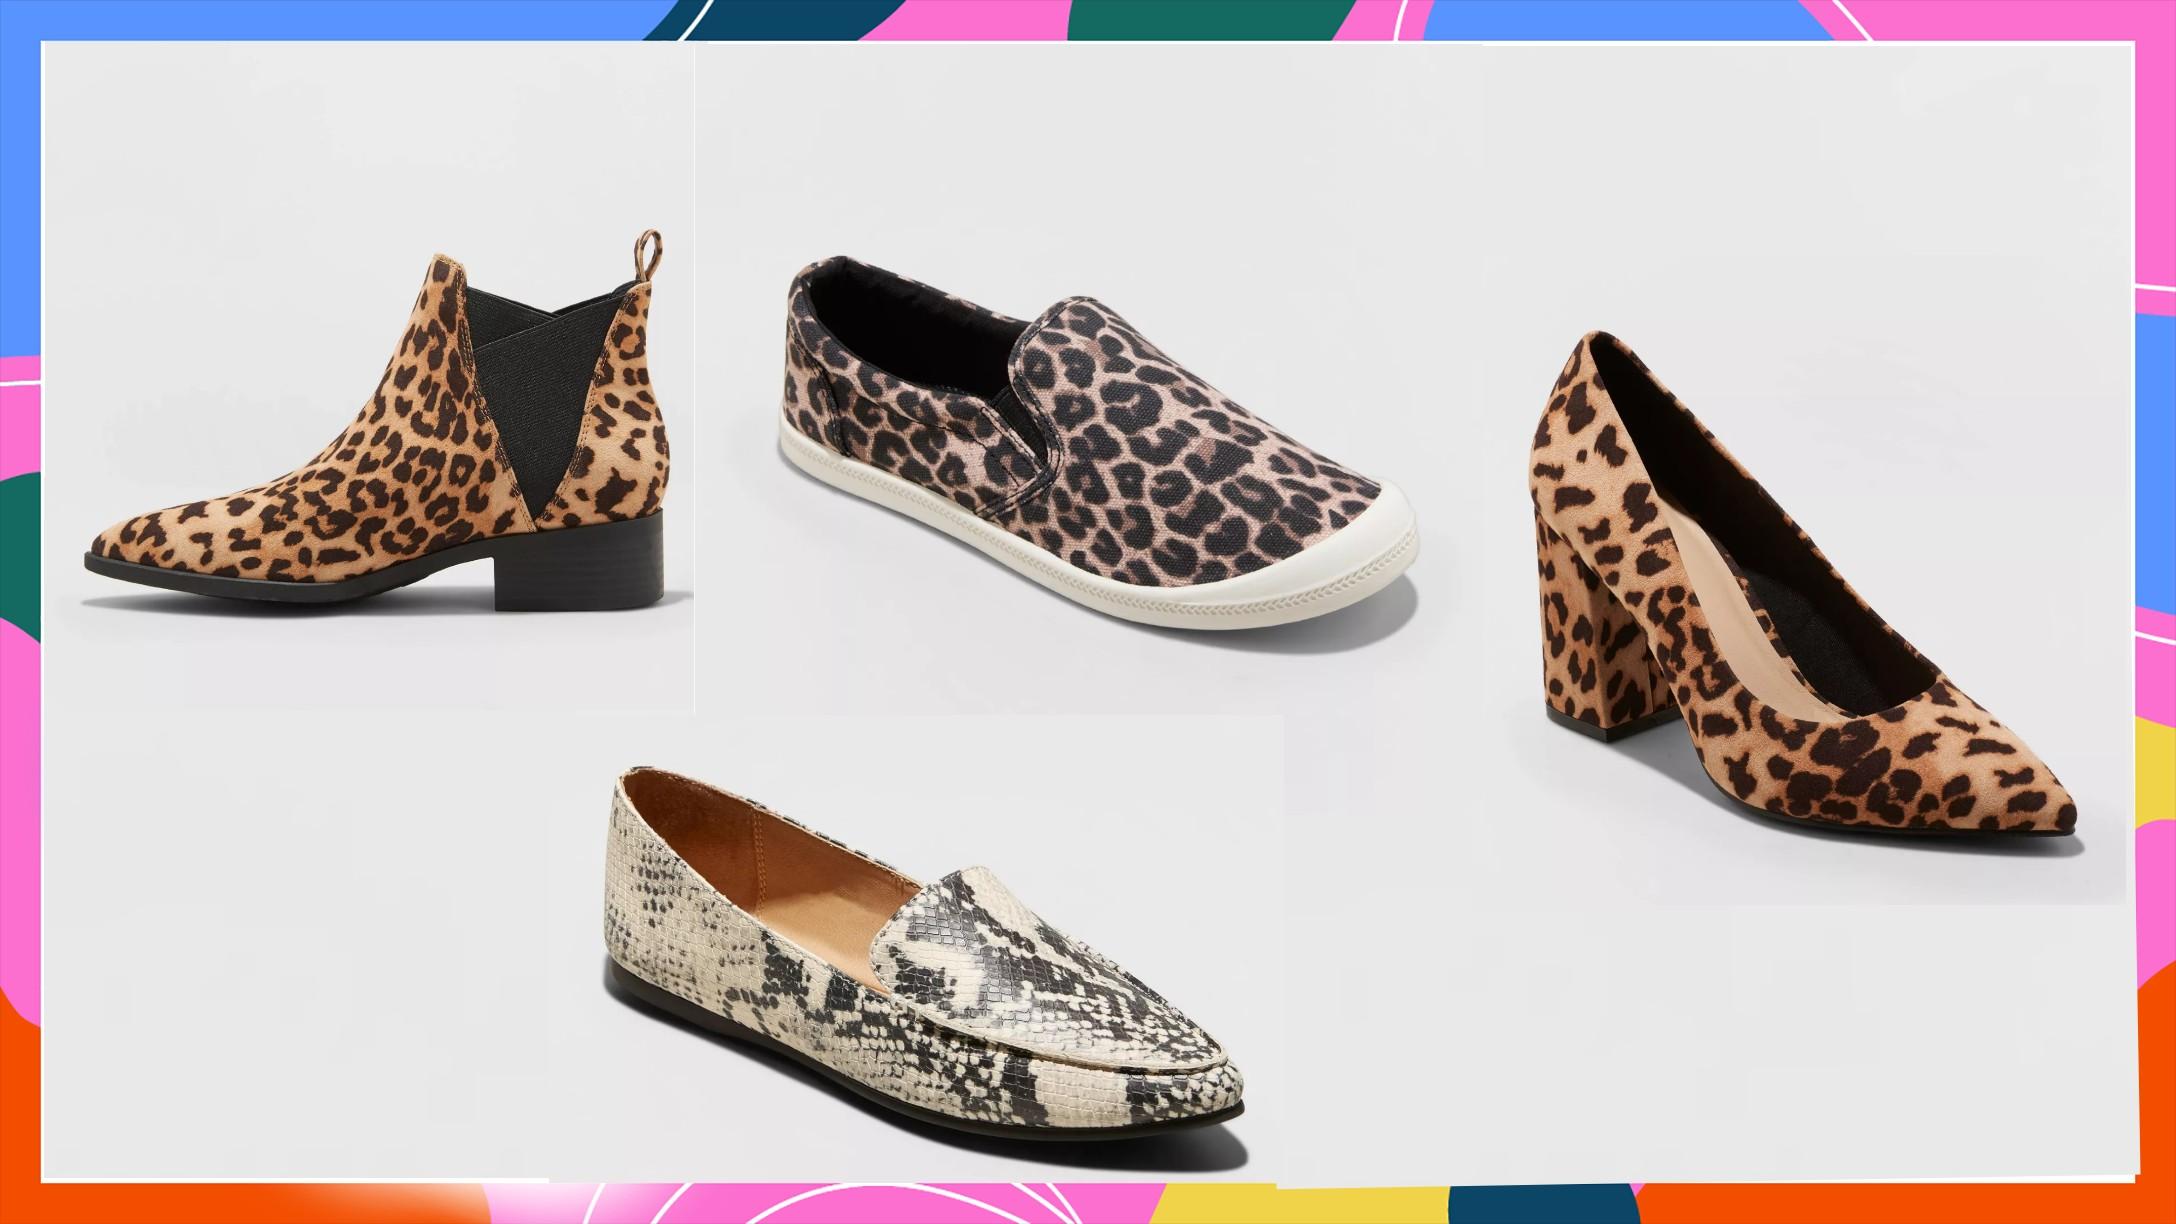 Leopard Print Shoes Are Super